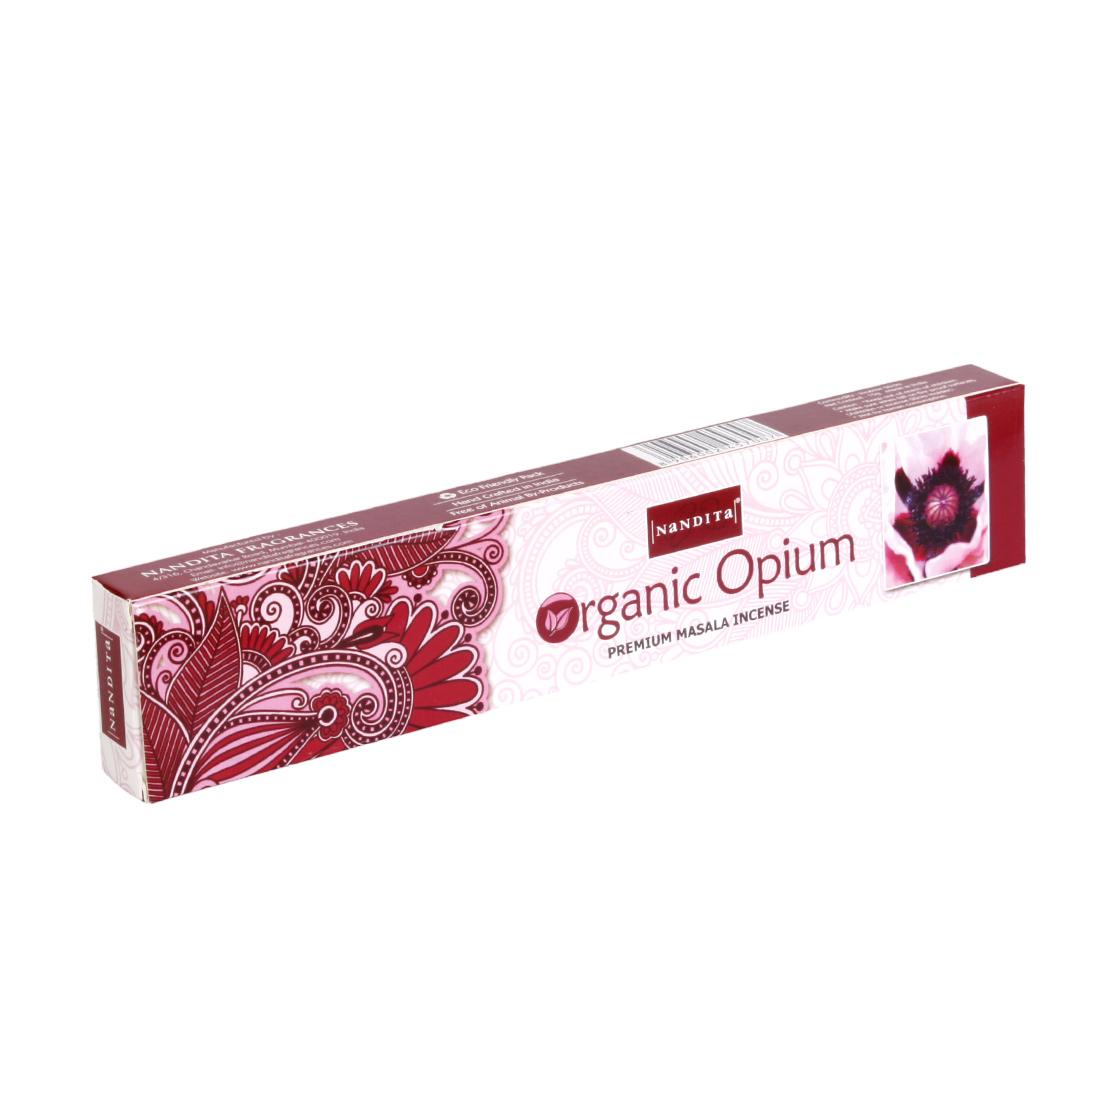 encens nandita opium